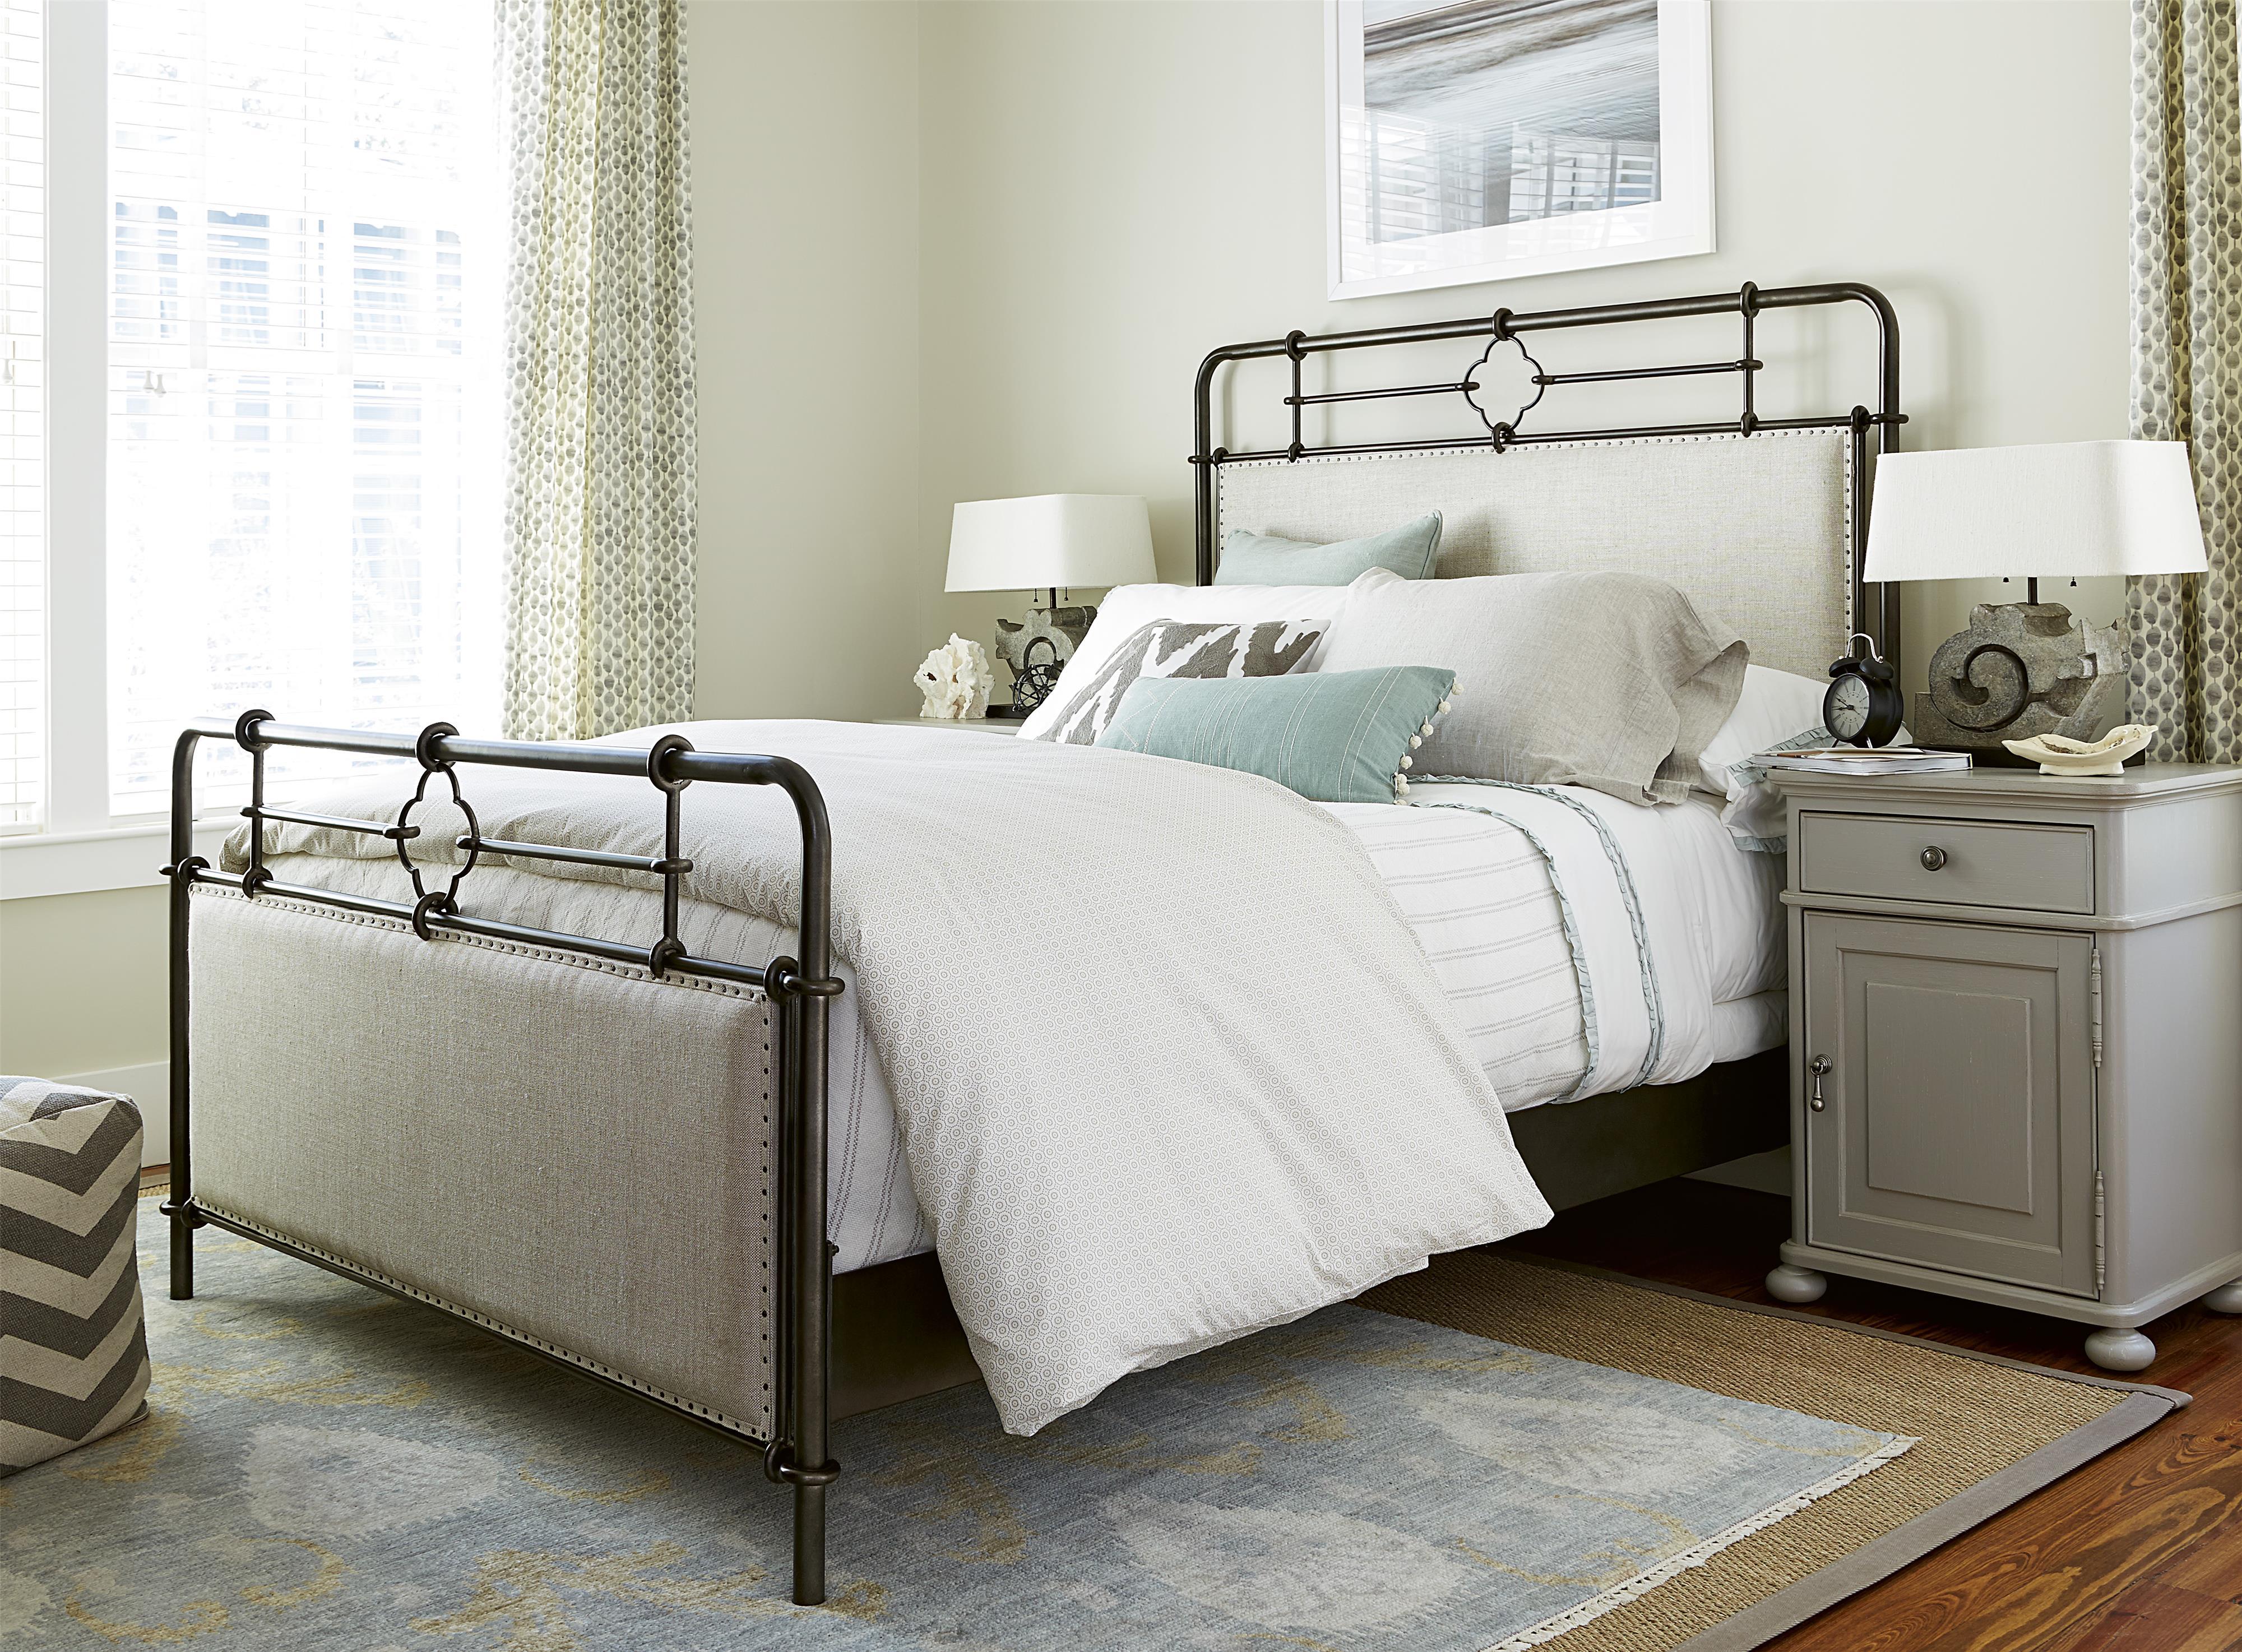 Paula Deen By Universal Dogwood King Bedroom Group Wayside Furniture Bedroom Groups